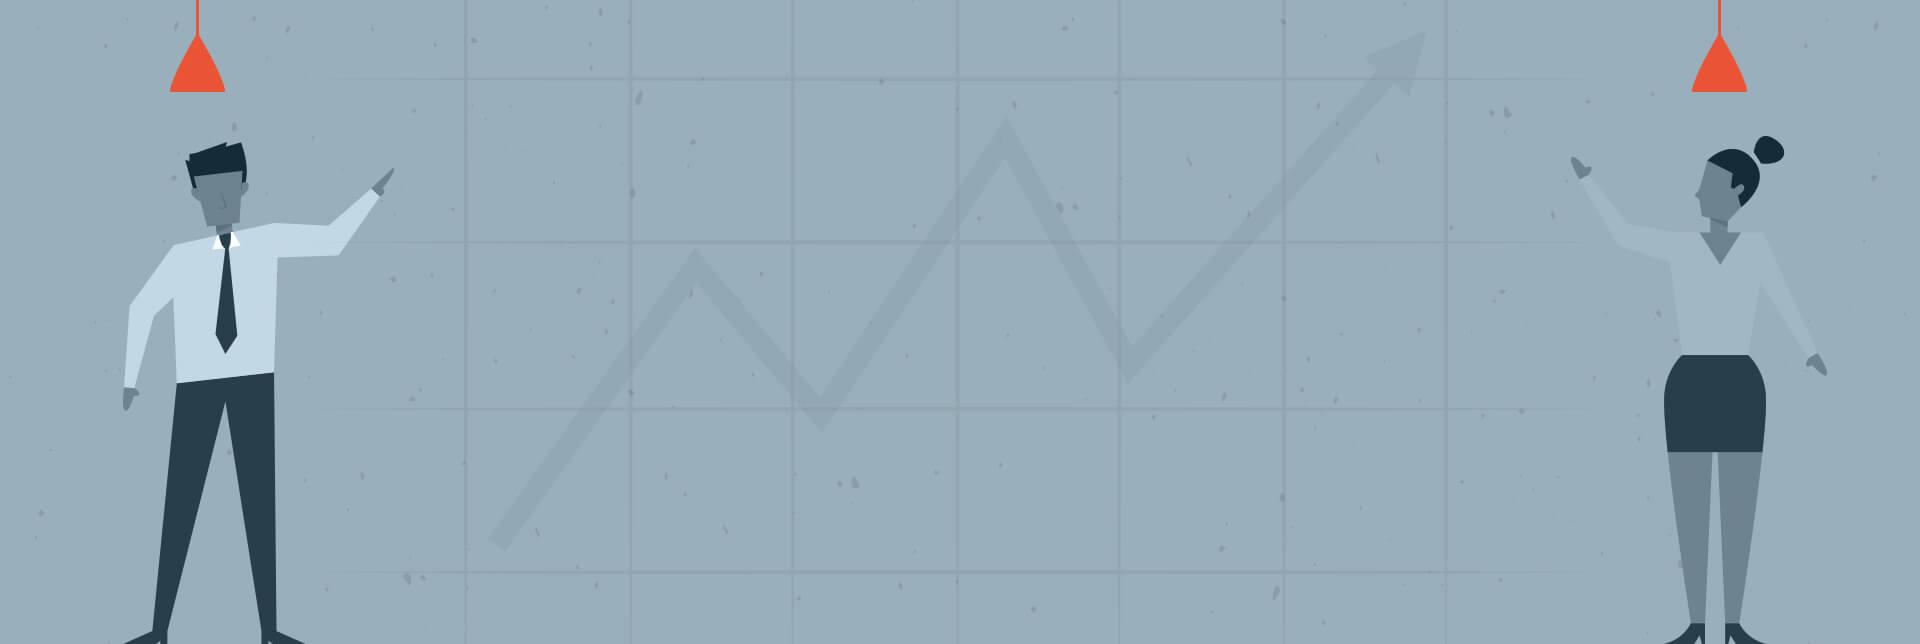 Stock Market Betting Software Development | Stock Market Betting Solutions